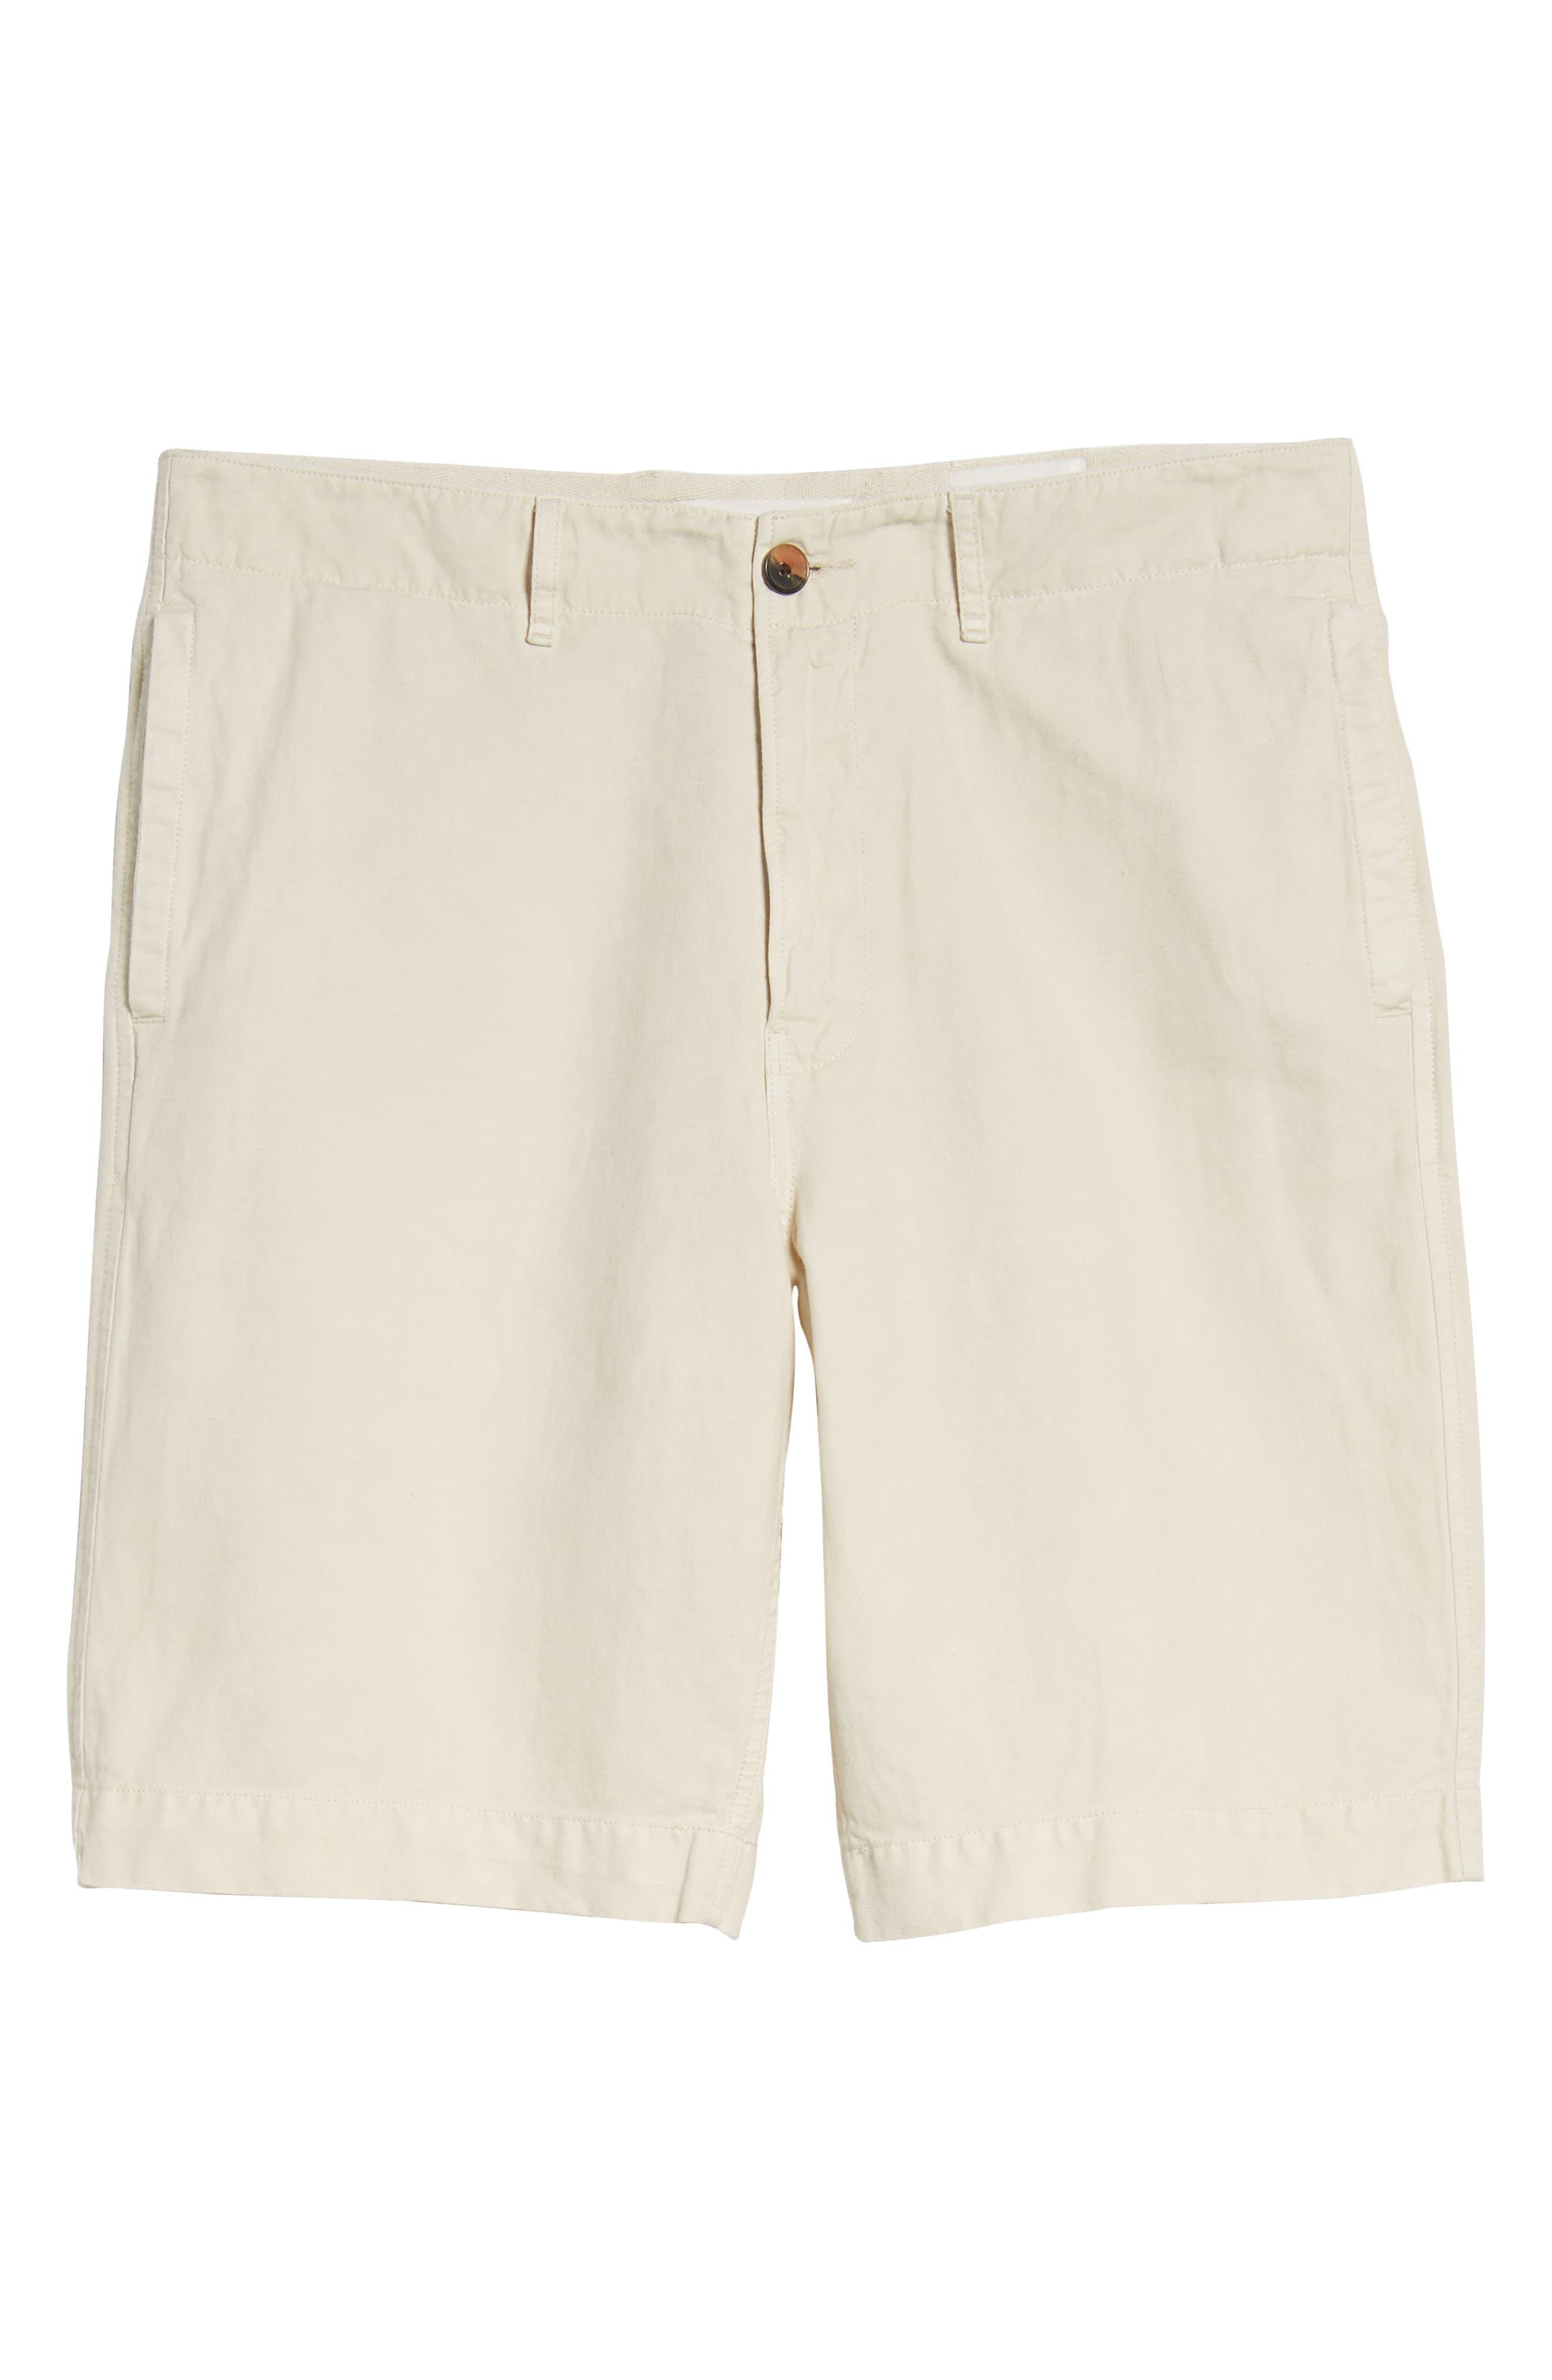 Clyde Cotton & Linen Shorts,                             Alternate thumbnail 6, color,                             EGGSHELL